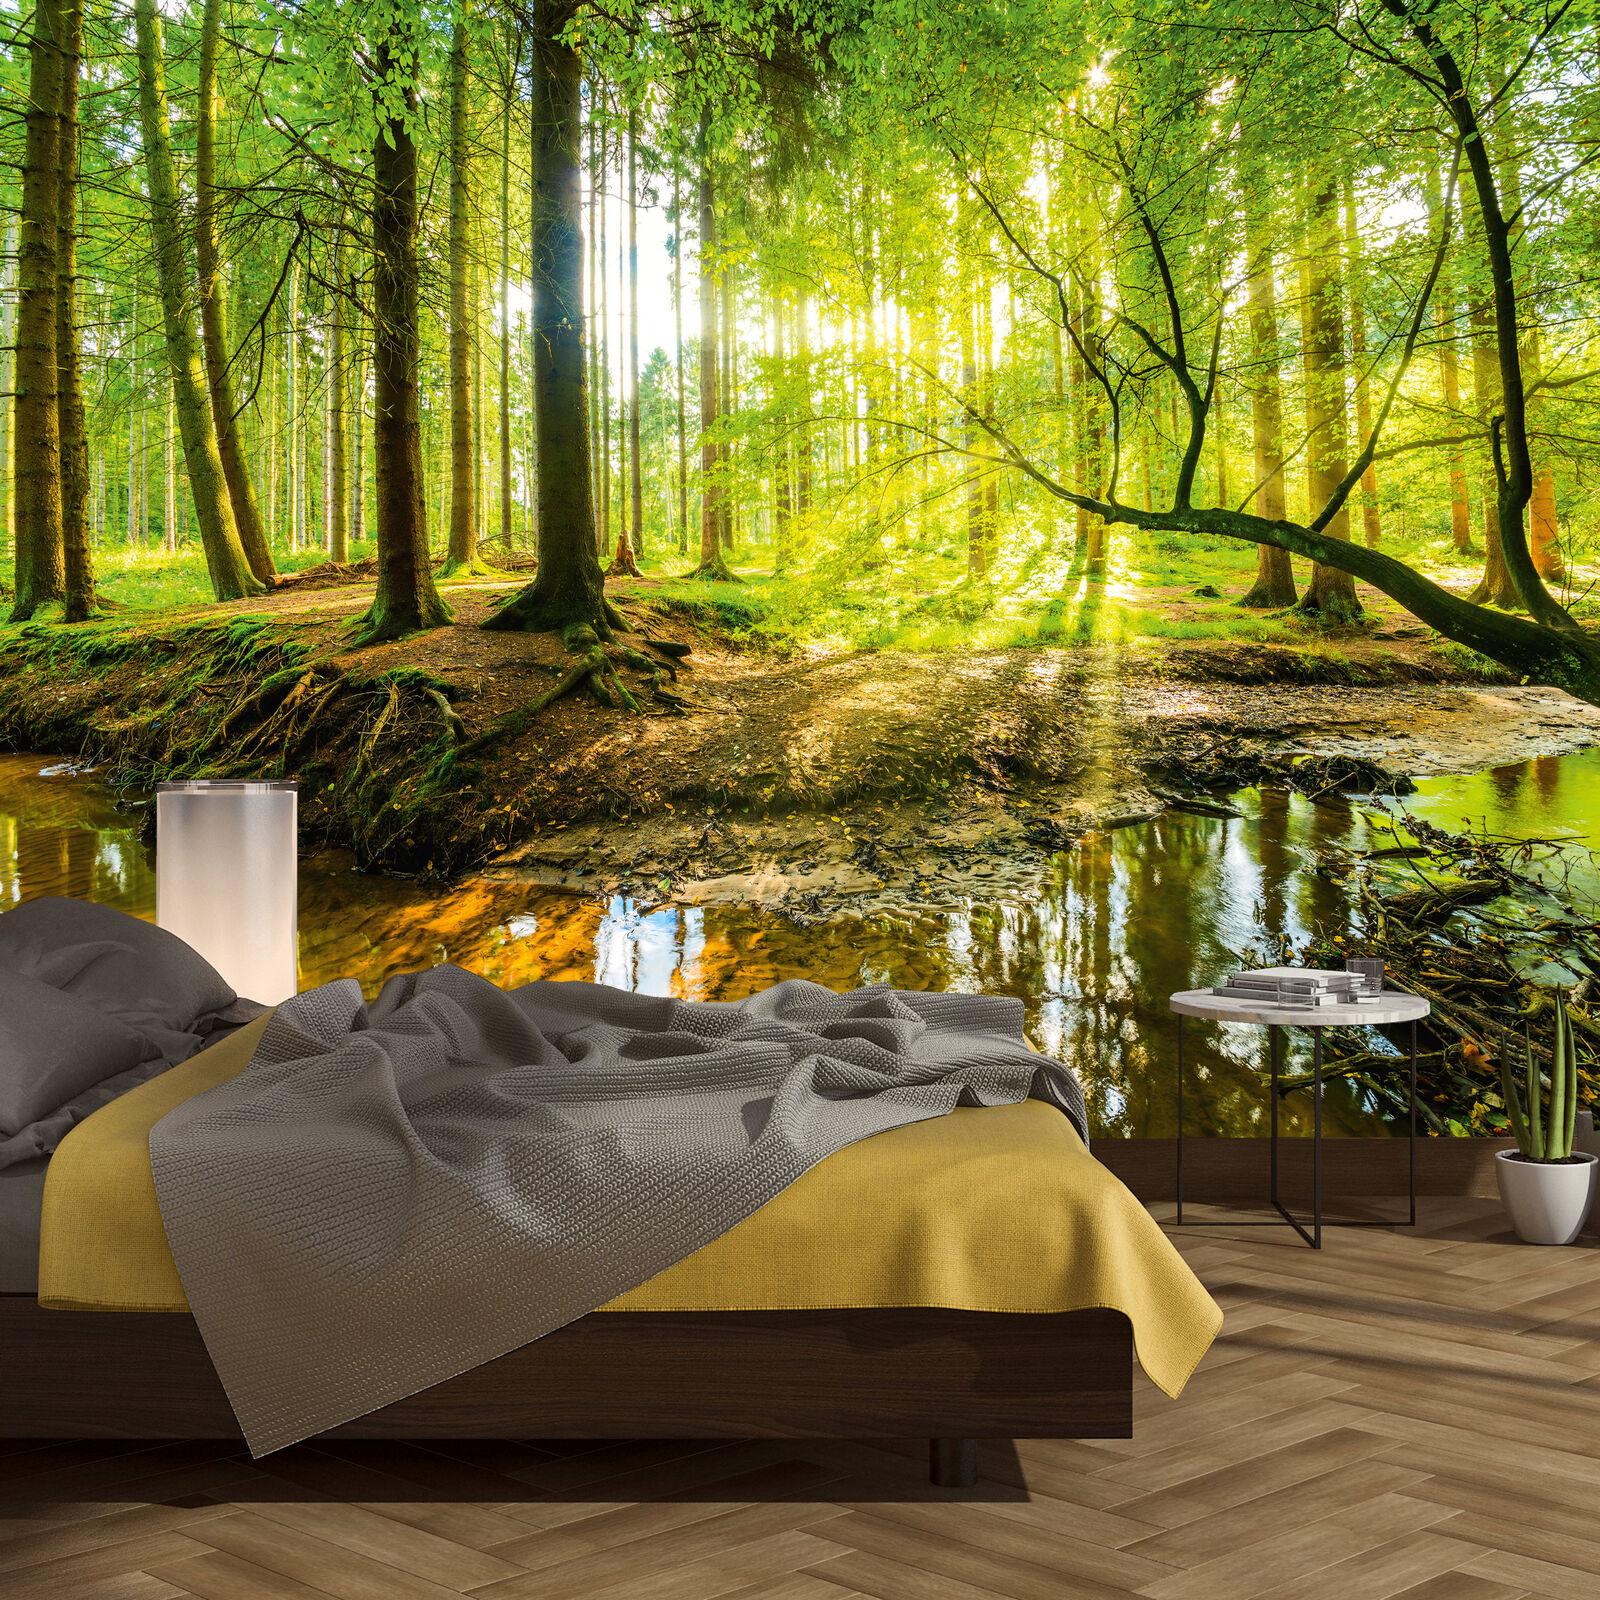 Carta da Parati Foresta 366 x 254 cm Legno Alberi Luce solare fotomurali